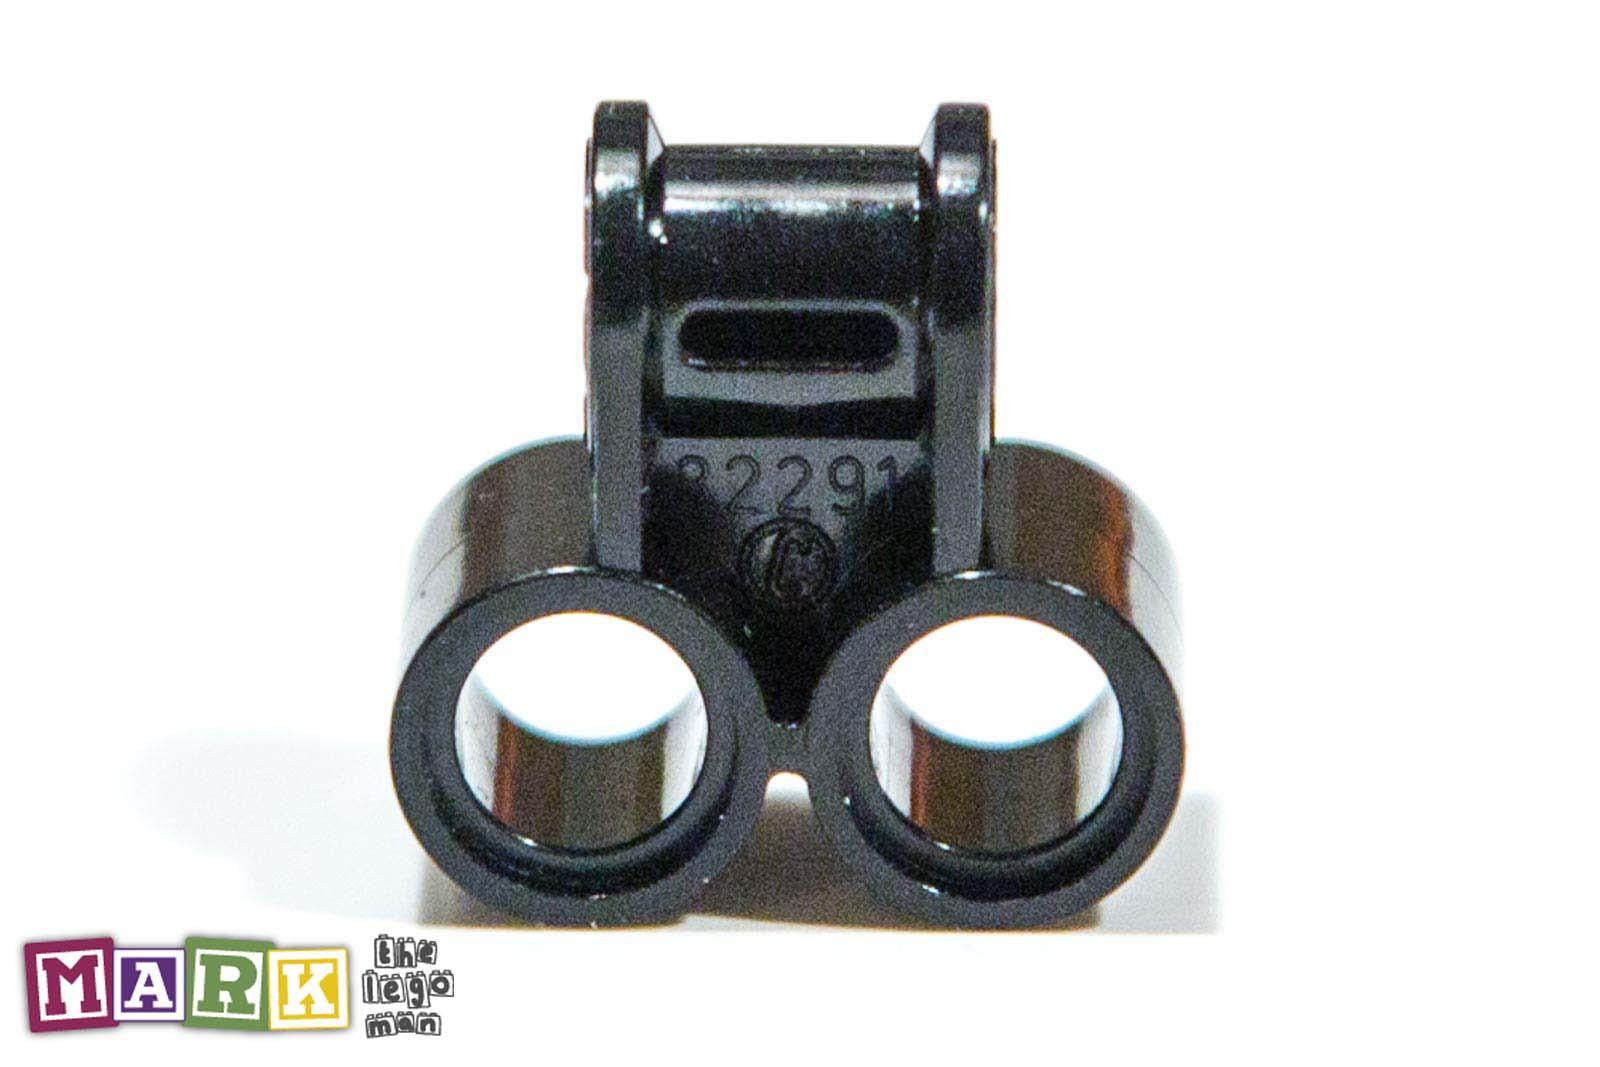 Lego 4140430 32291 1x Black 2x1 Technic Cross Block